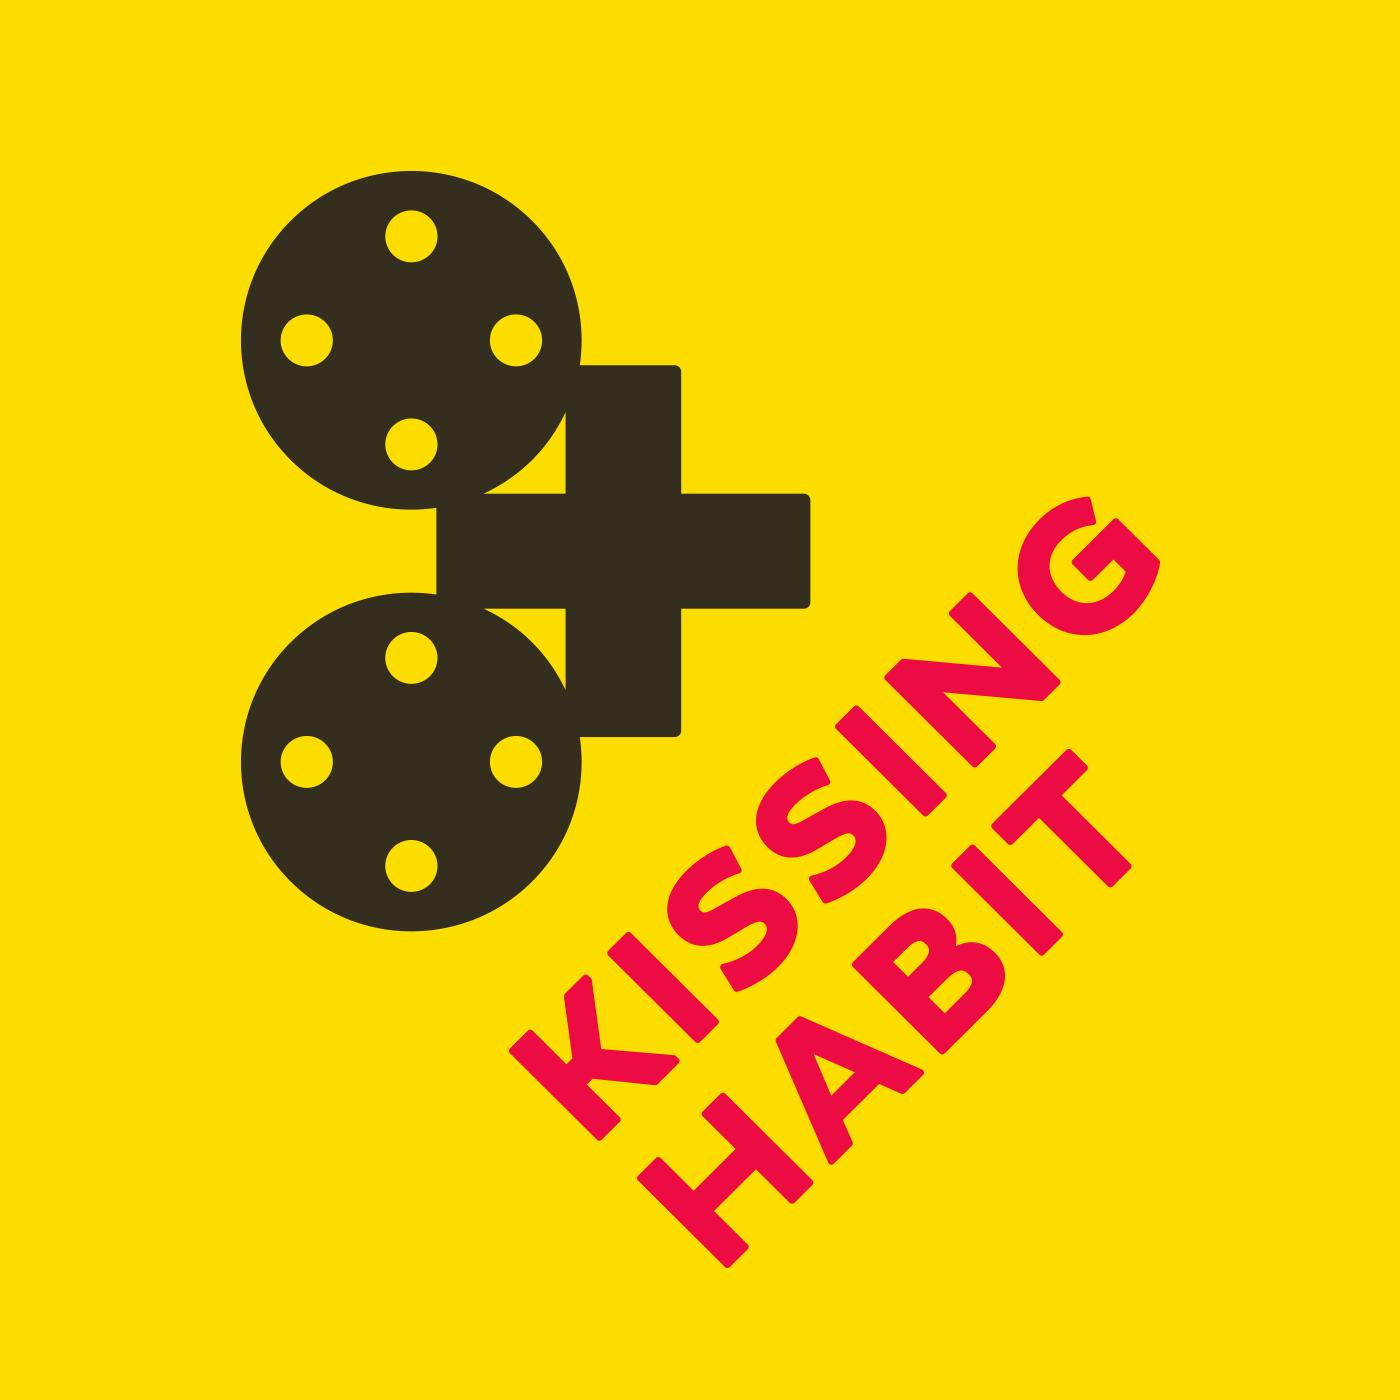 Kissing Habit on Yellow.jpg